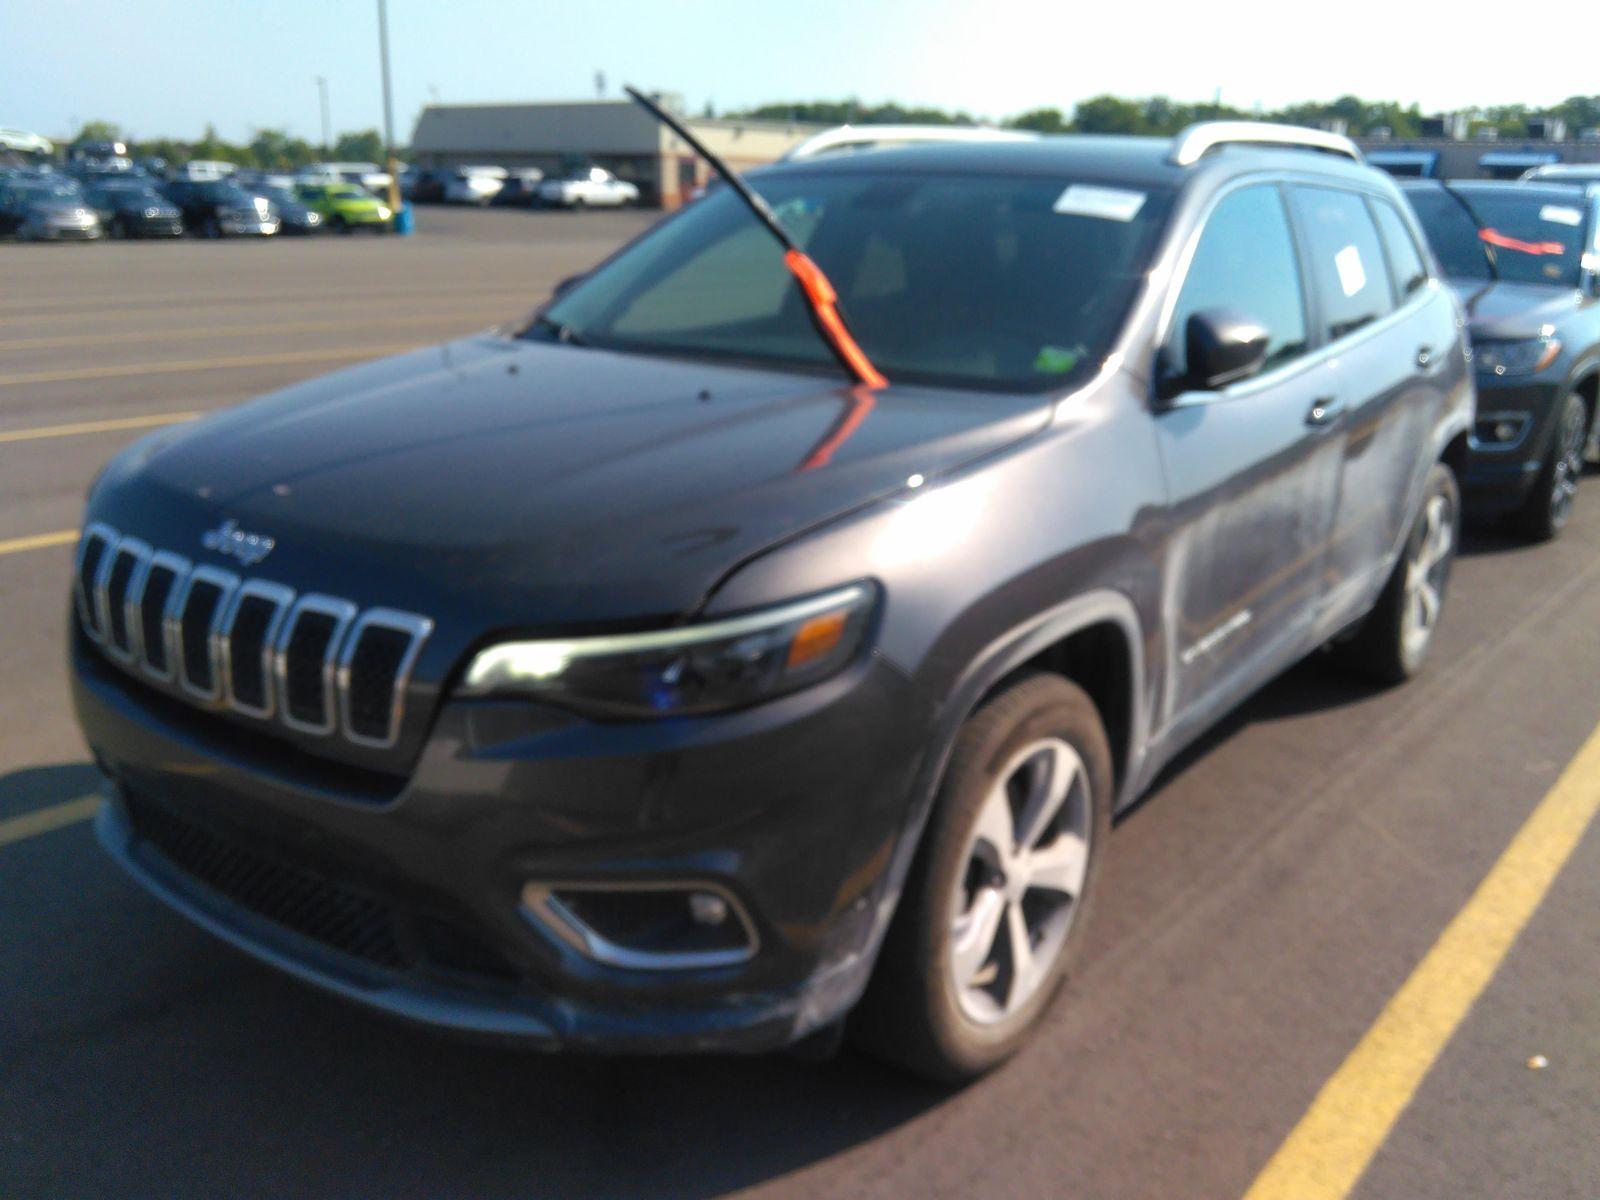 2019 Jeep Grand cherokee 3.2. Lot 99913669836 Vin 1C4PJMDX2KD157664